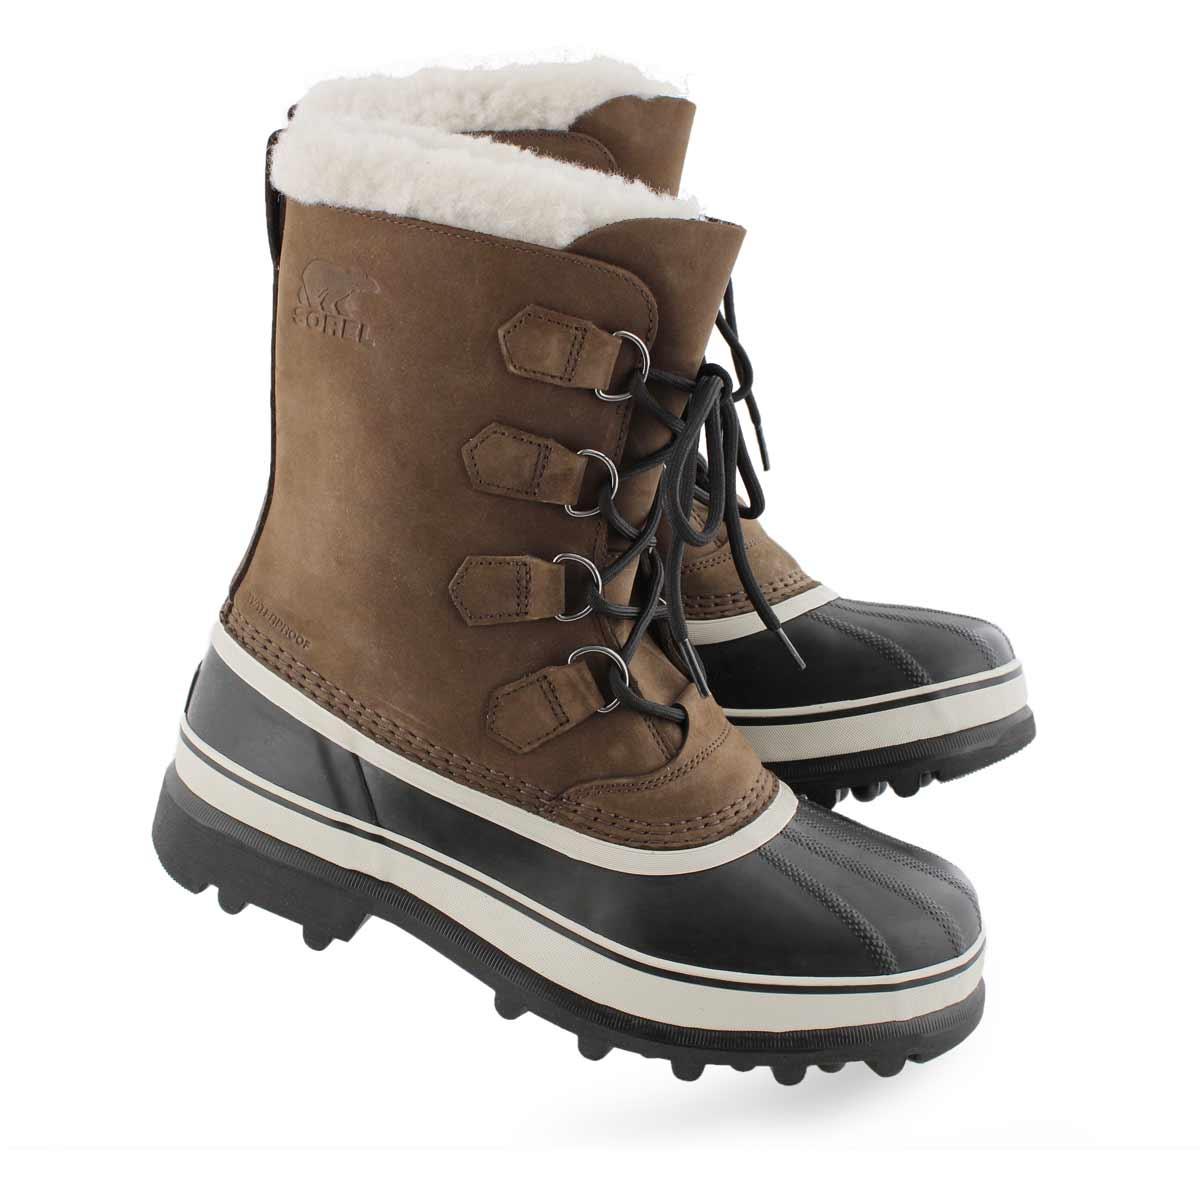 Mns Caribou bruno wtpf winter boot